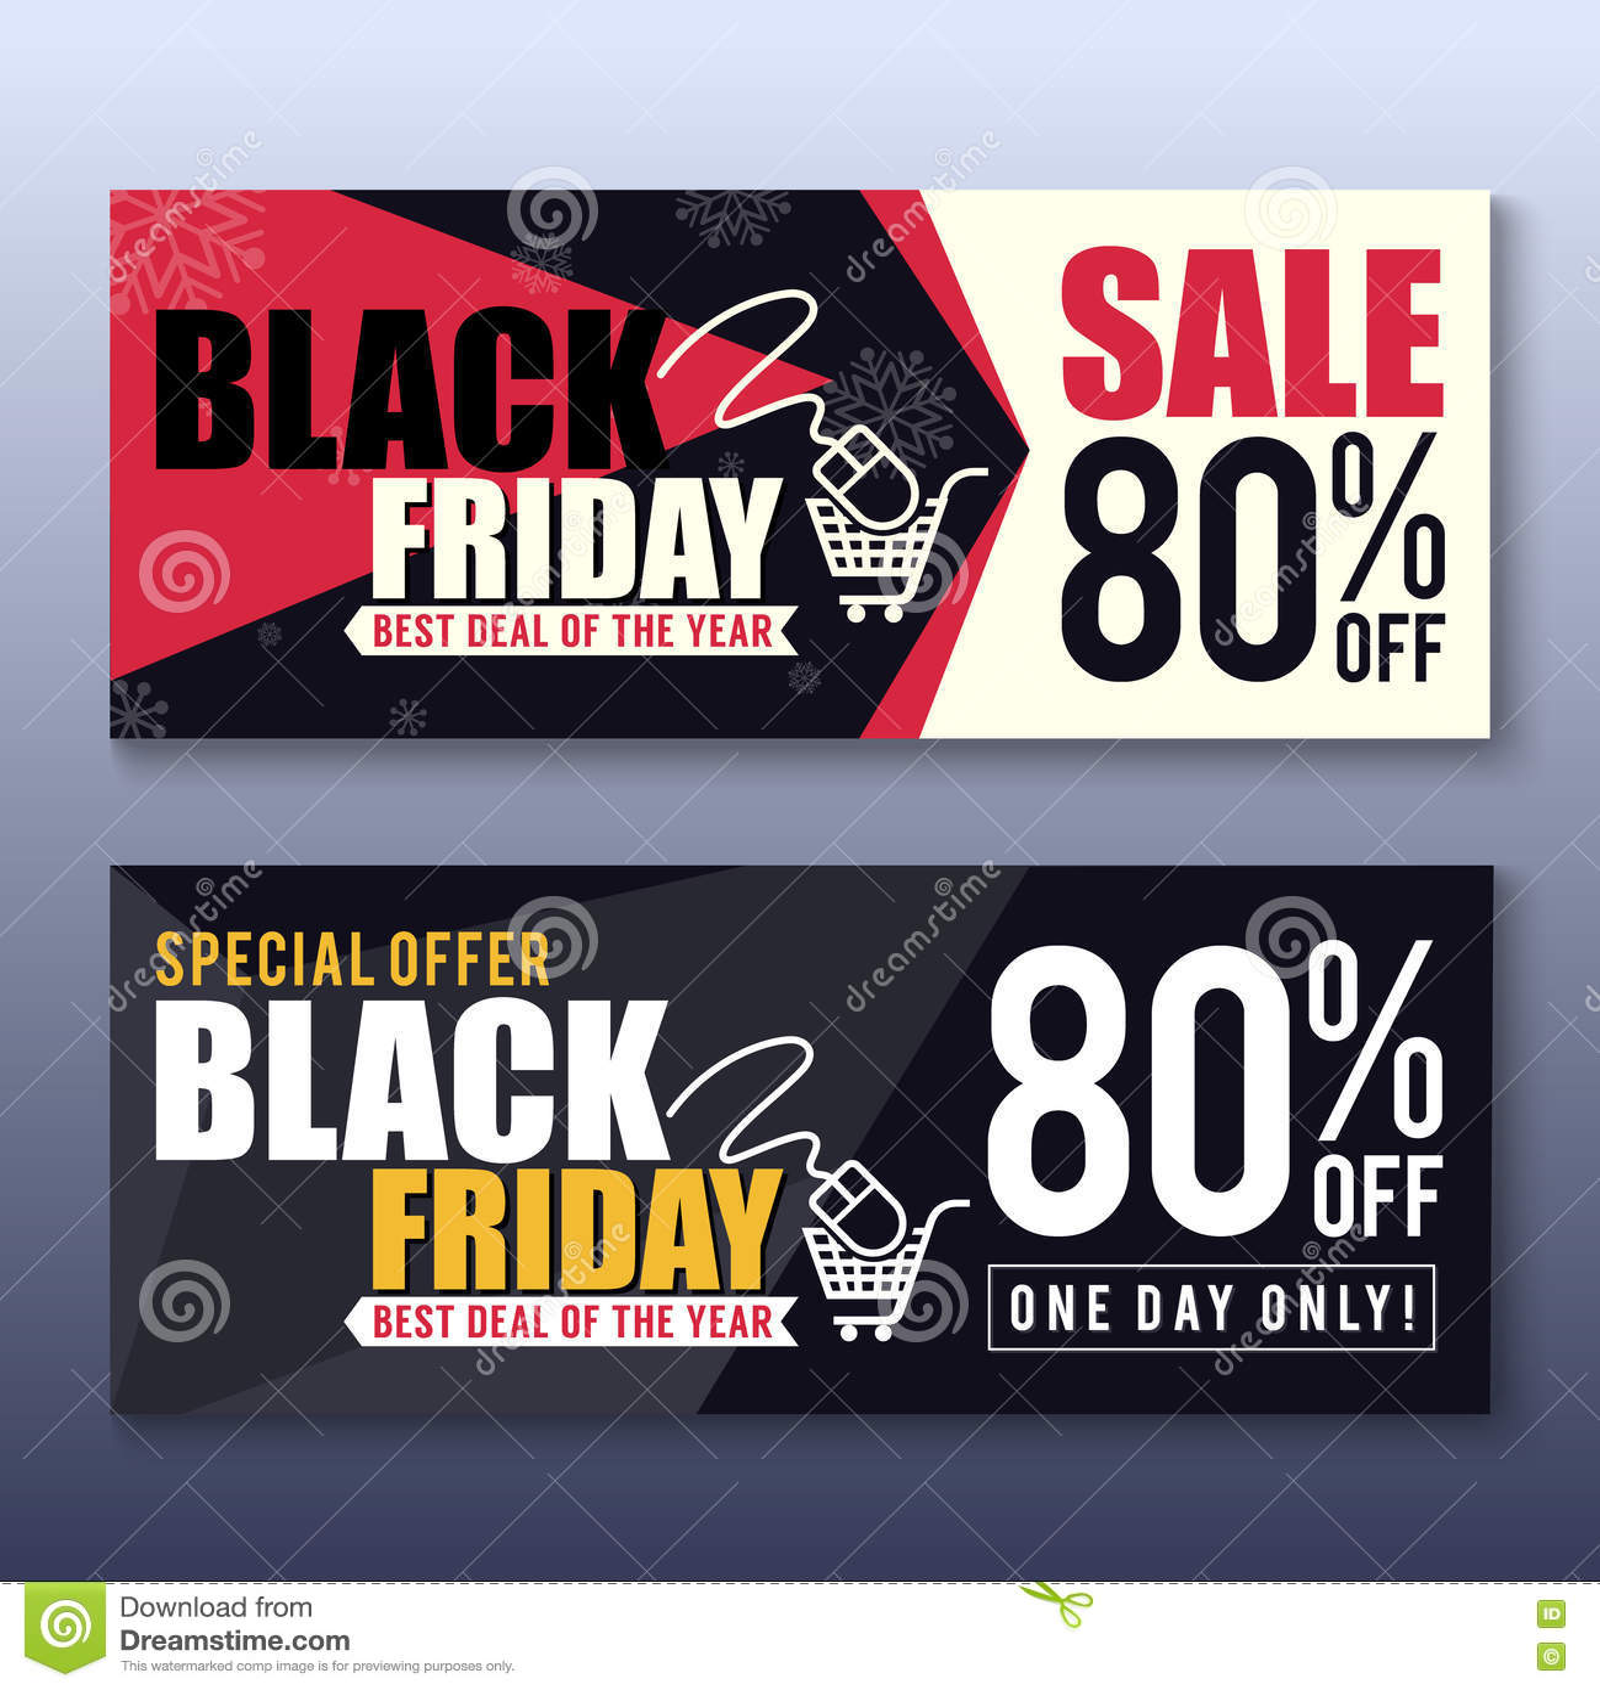 4f338e3c3991 Black Friday Sale Banner Background for Good Deal Promotion. Black Friday  Tags and Label Design.Vector illustration. More similar stock illustrations